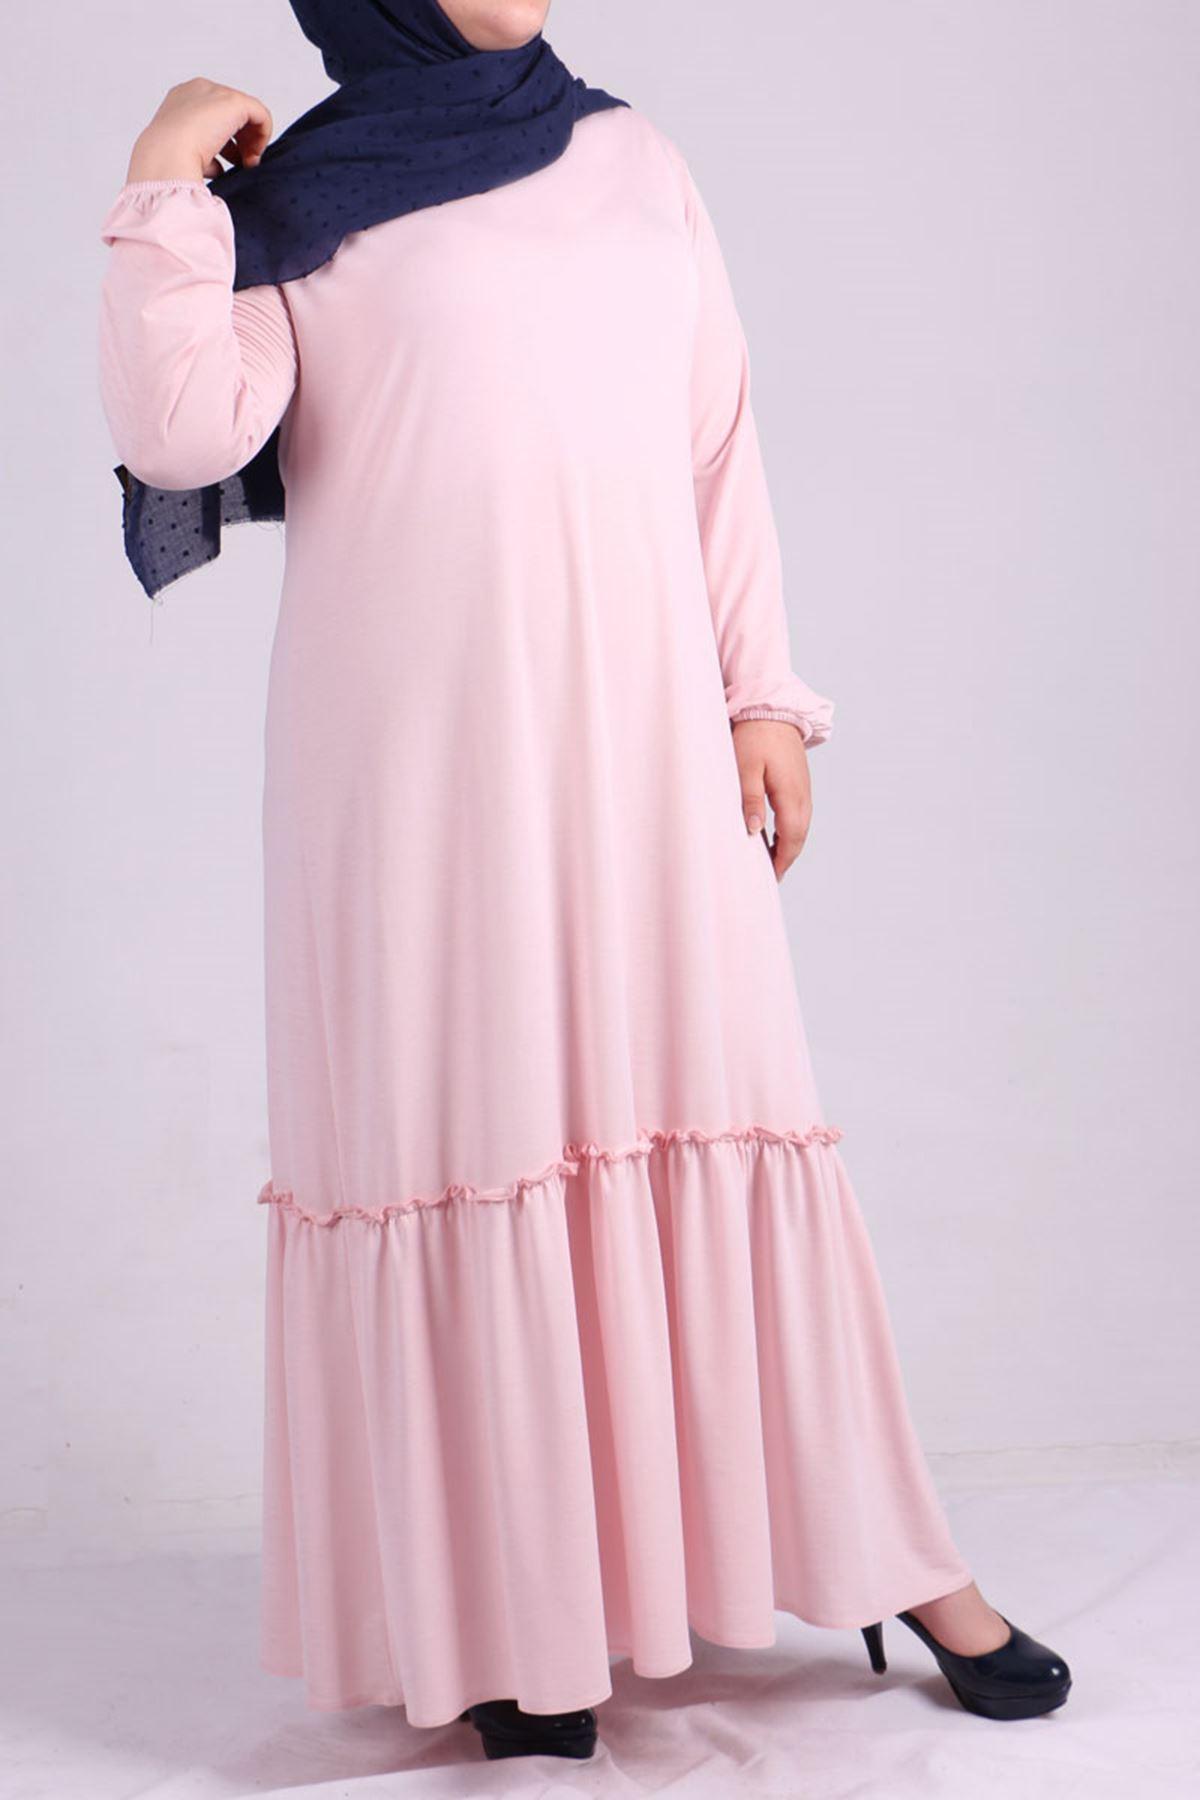 2089 Plus Size Sleeve Elastic Dress-Powder